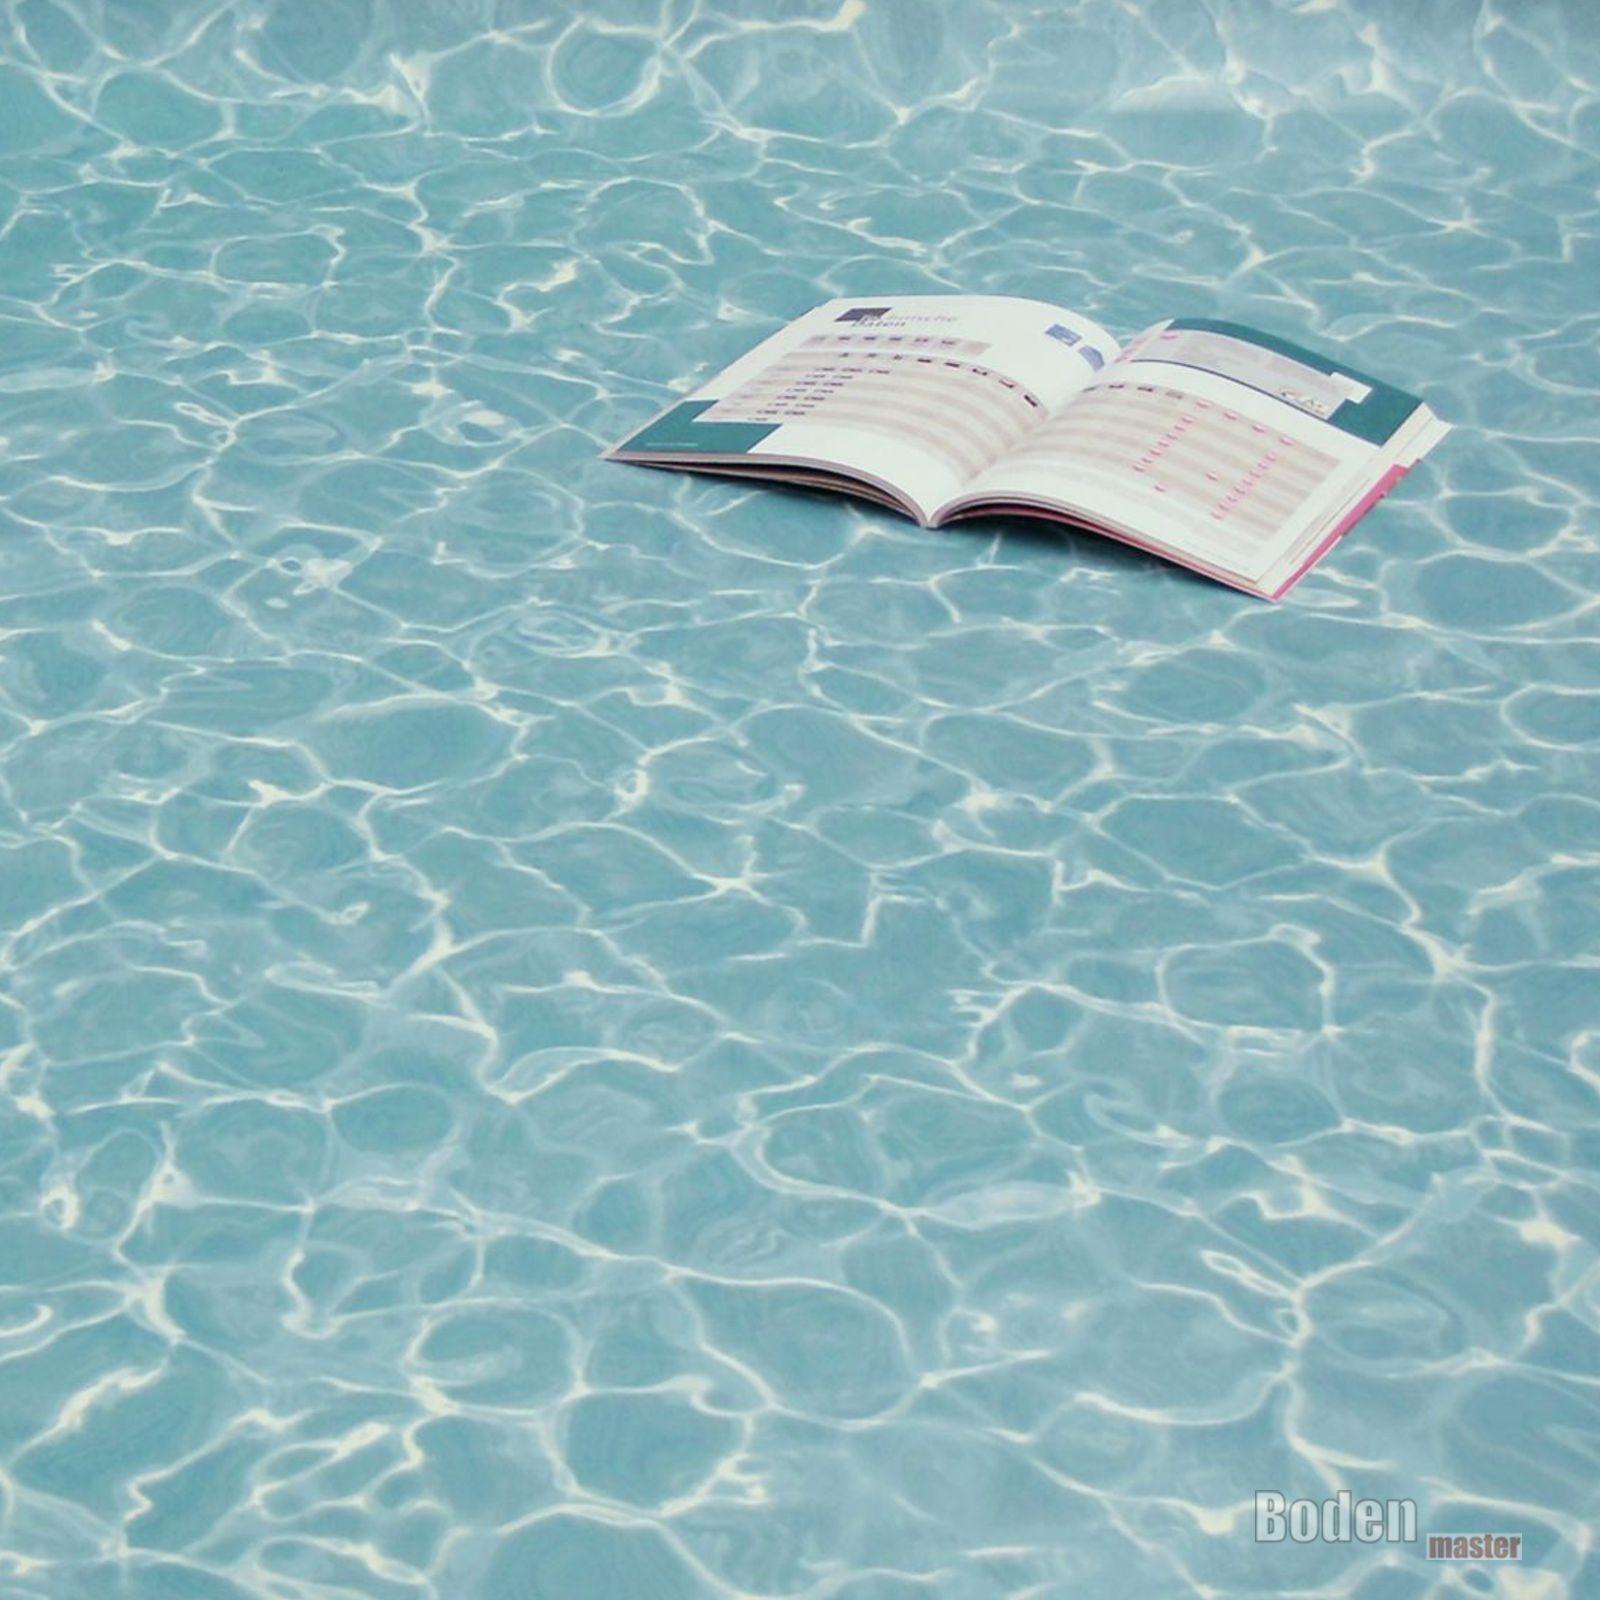 PVC Bodenbelag Wasser Blau Swimming Pool Blau Breite 3 m - 1m²/